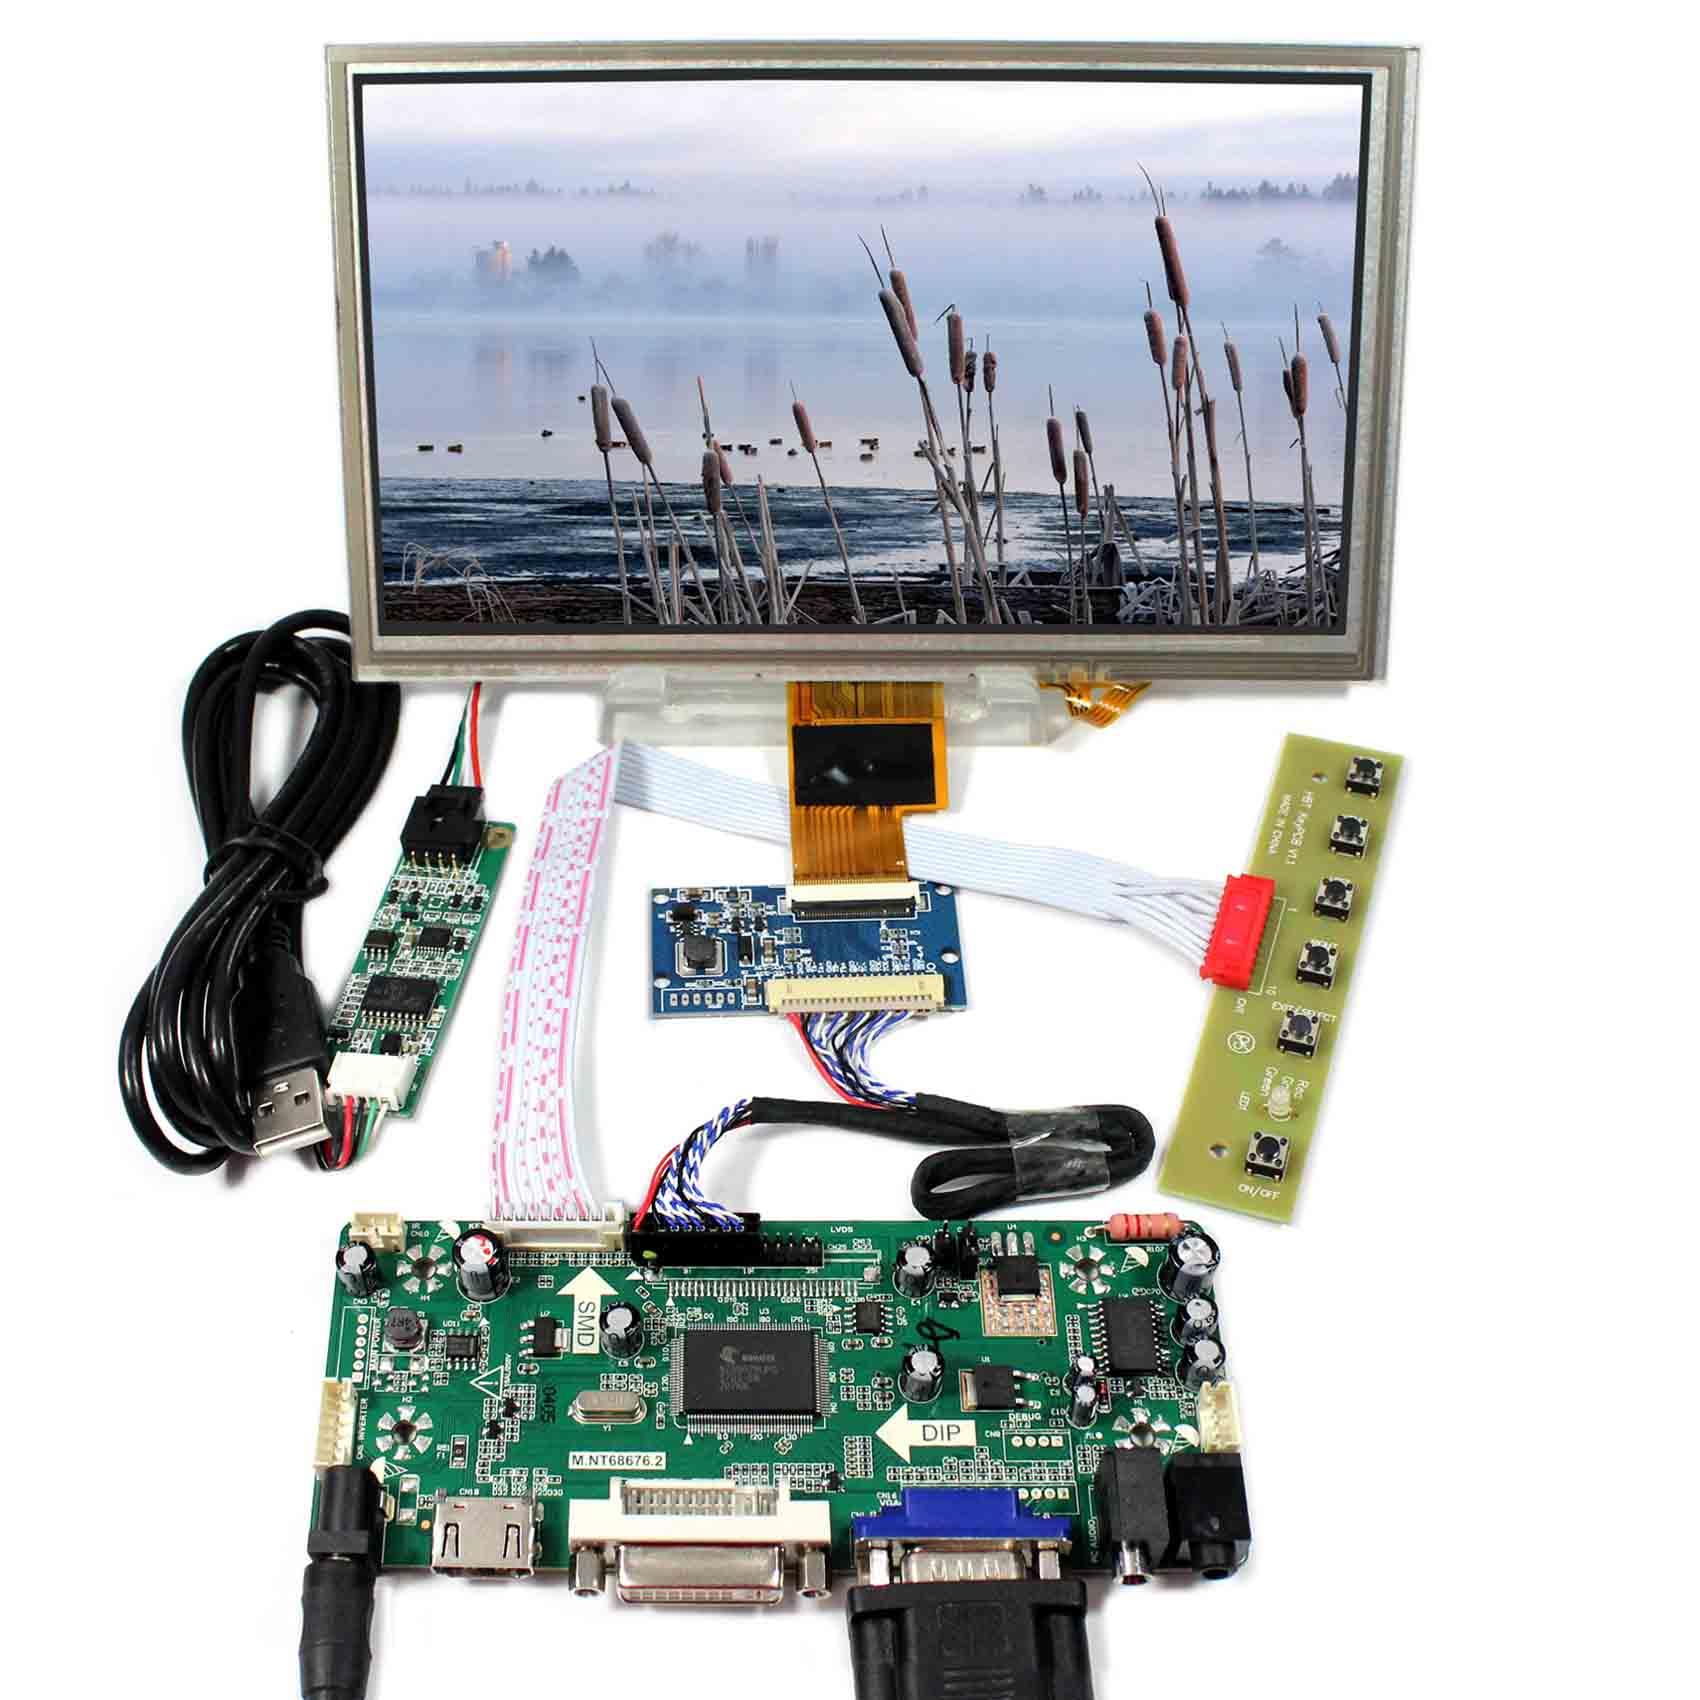 8 pollici ZJ080NA-08A 1024X600 Touch Screen + HDMI DVI VGA Audio Scheda di Controllo LCD M. NT686768 pollici ZJ080NA-08A 1024X600 Touch Screen + HDMI DVI VGA Audio Scheda di Controllo LCD M. NT68676